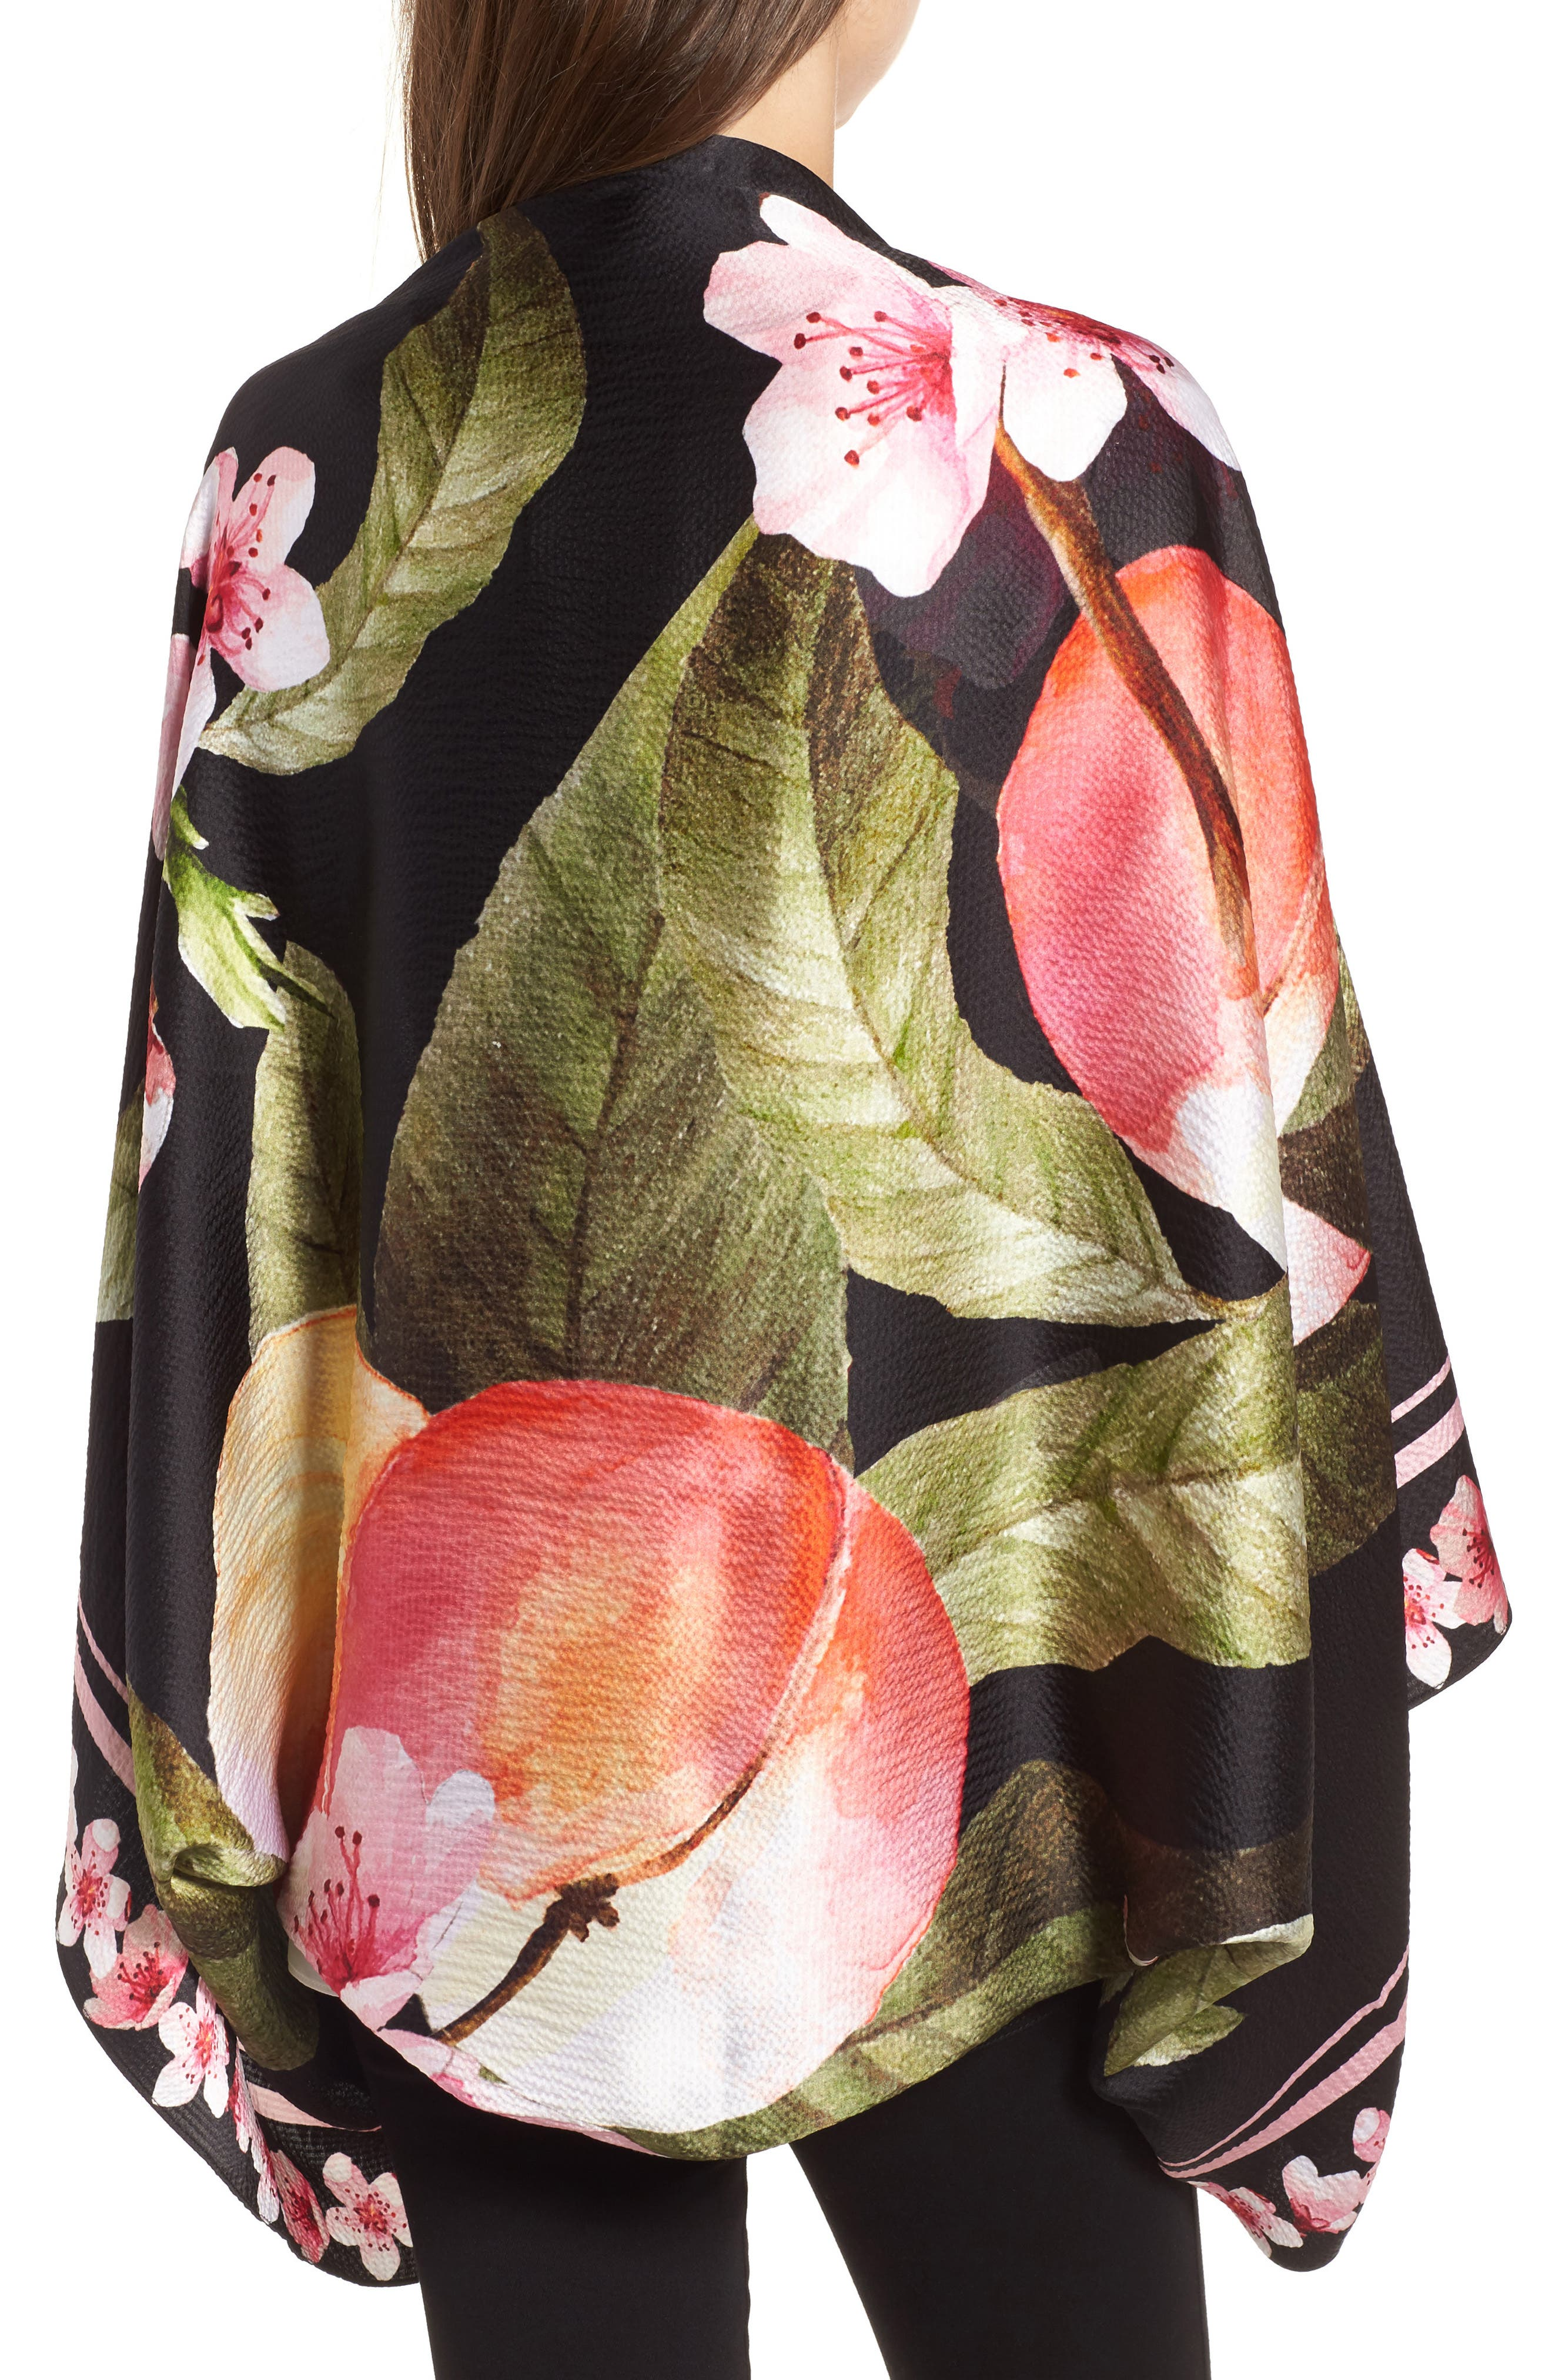 Peach Blossom Silk Cape Scarf,                             Alternate thumbnail 2, color,                             00-Black